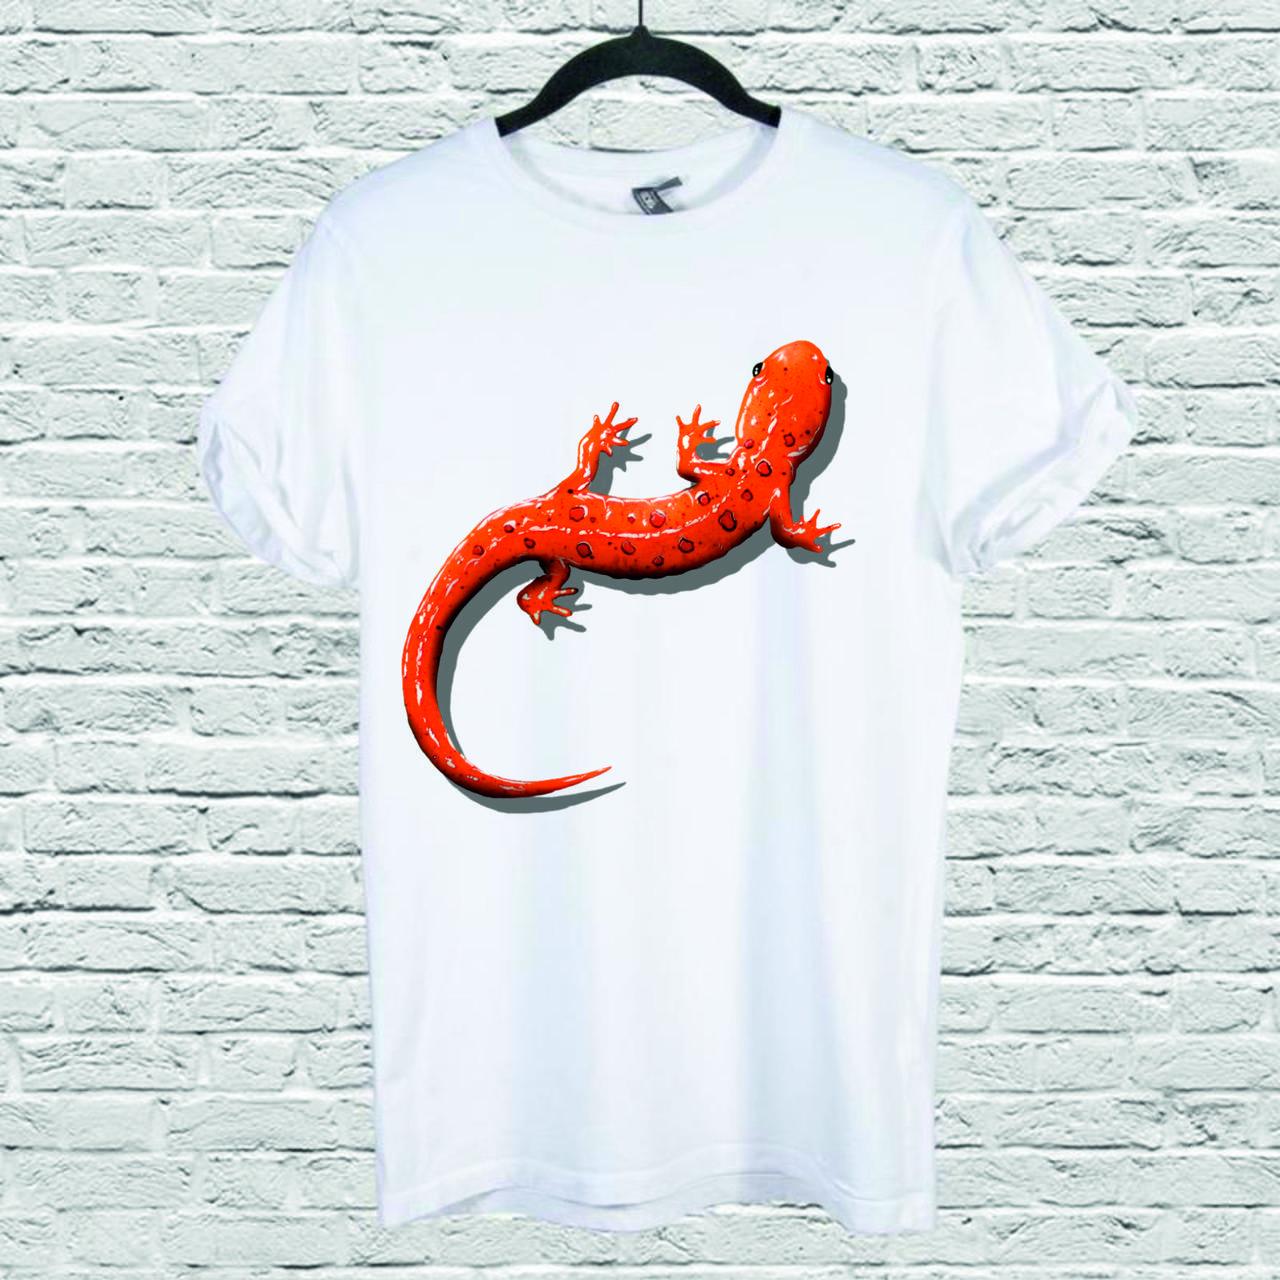 Футболка с принтом Red Spotted Salamander